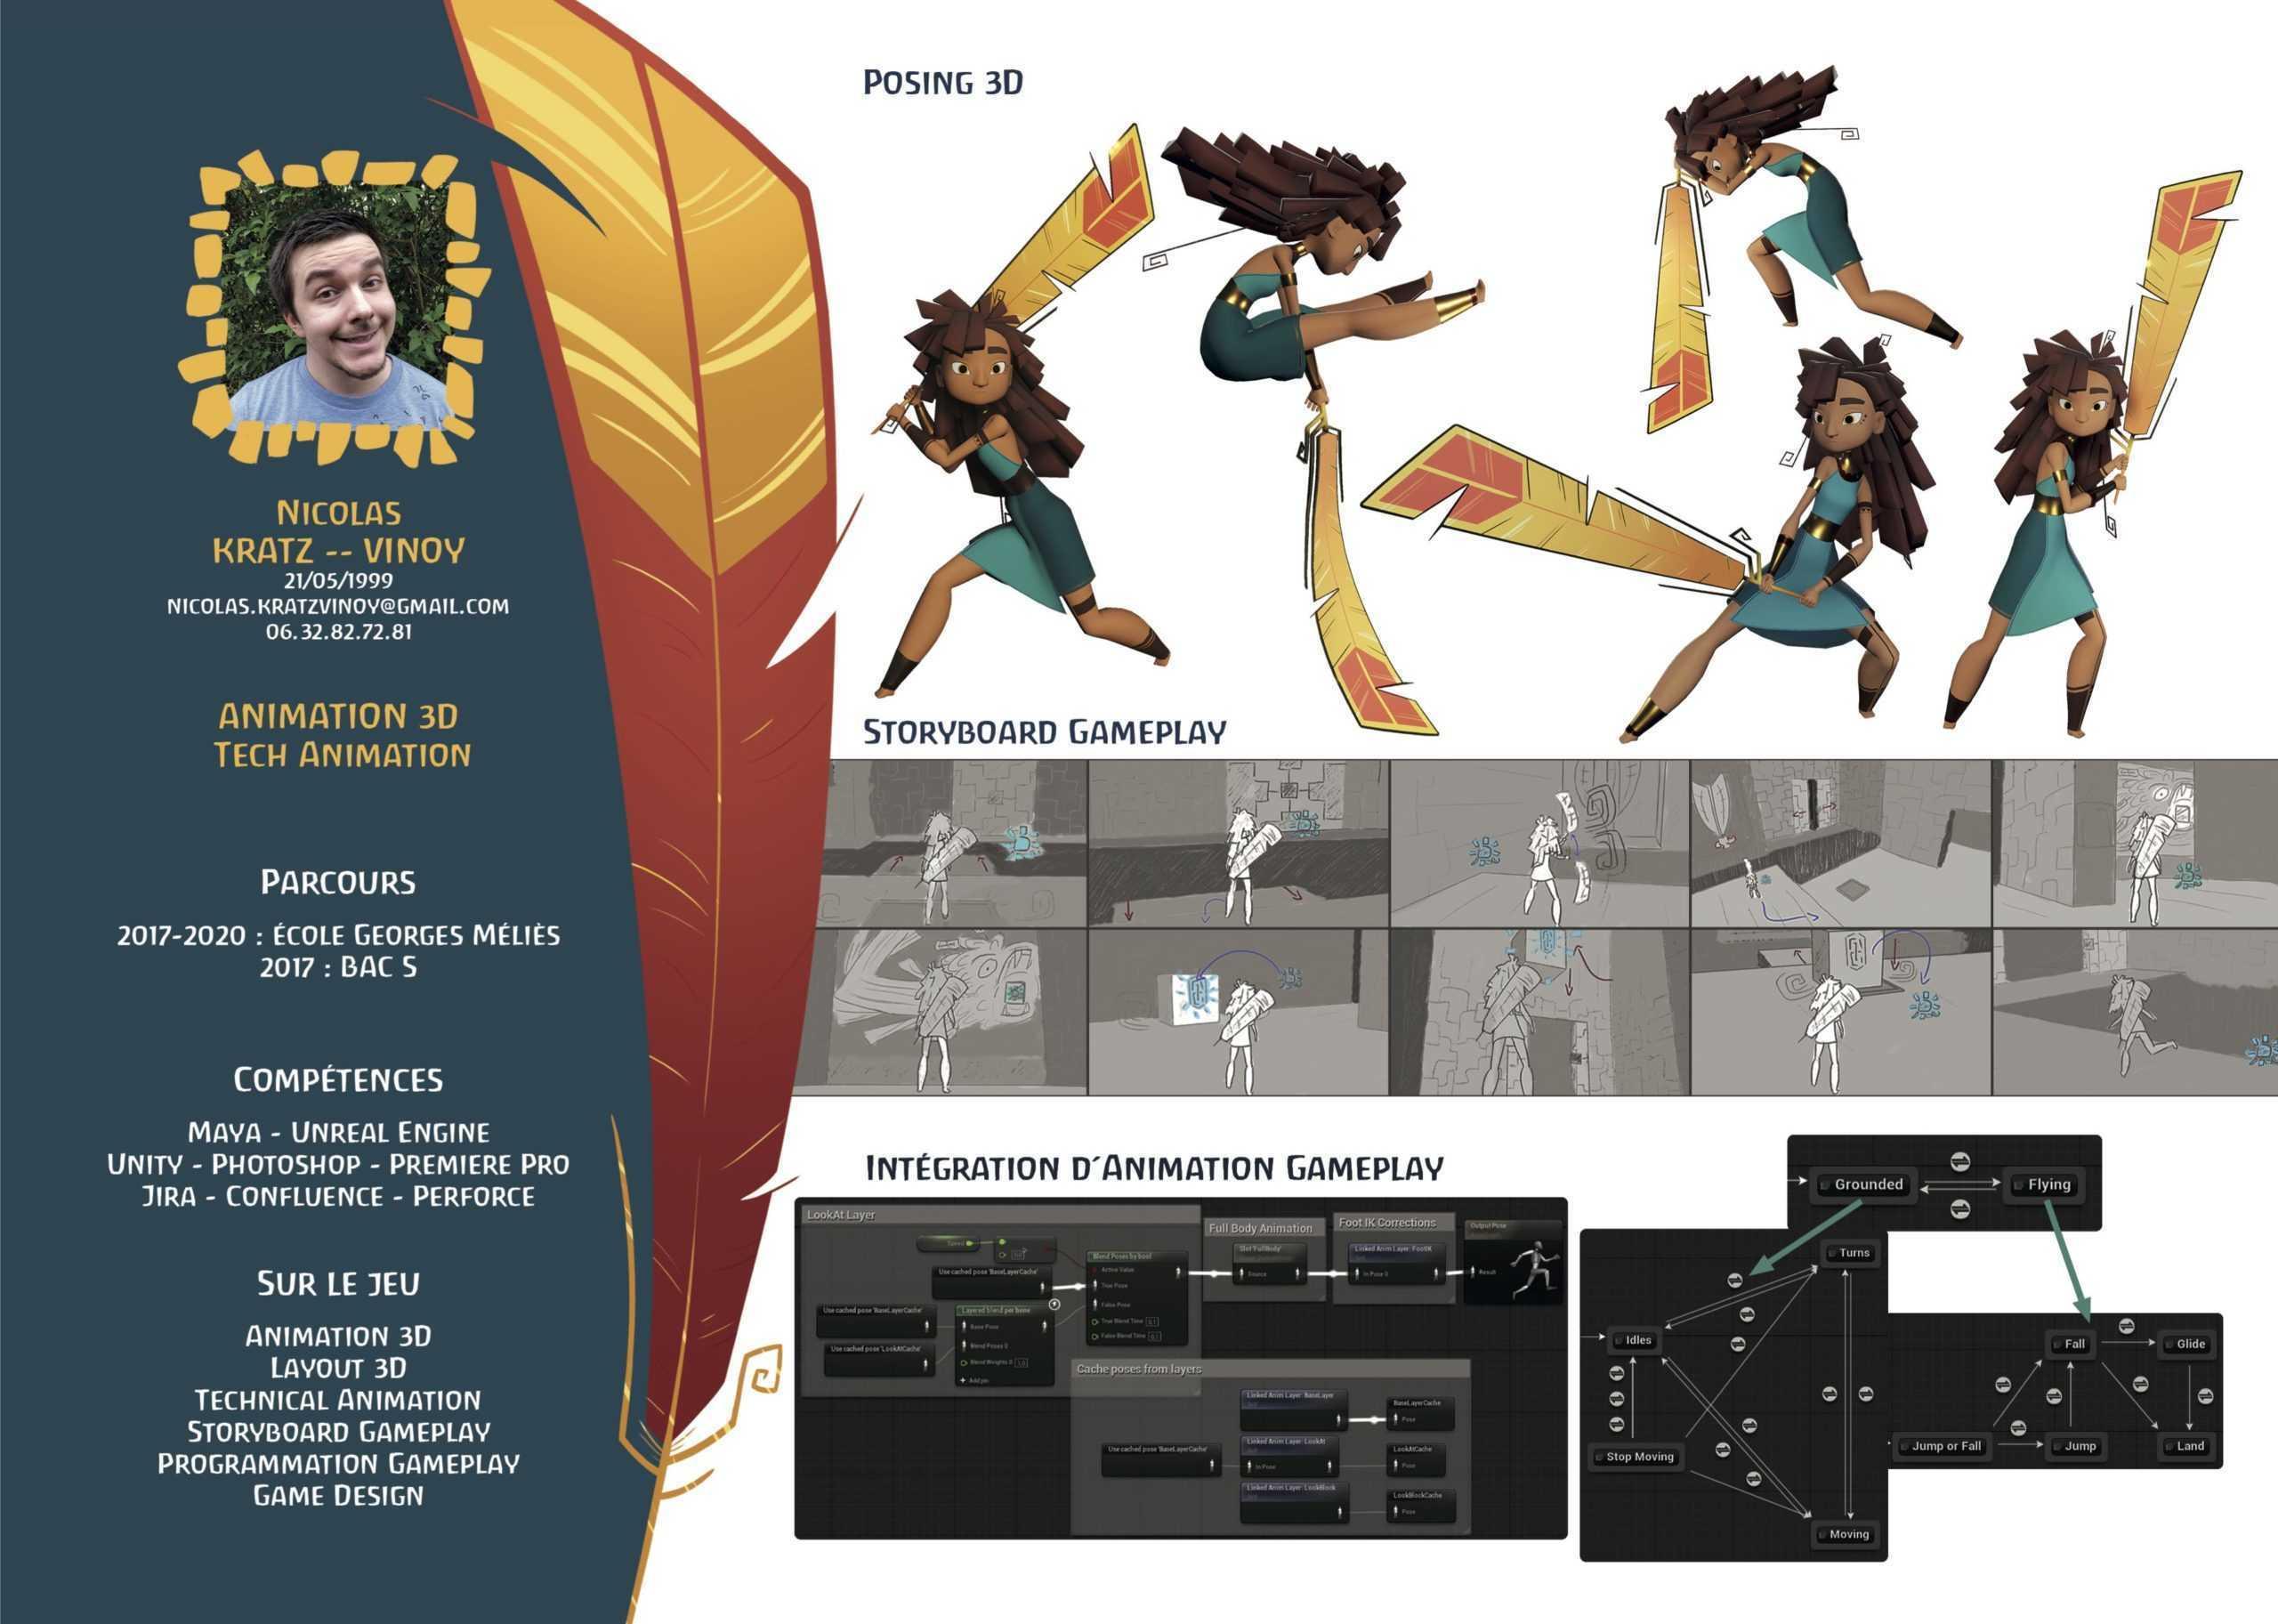 meika-artbook-nicolas-kratz-vinoy-1-scaled.jpg